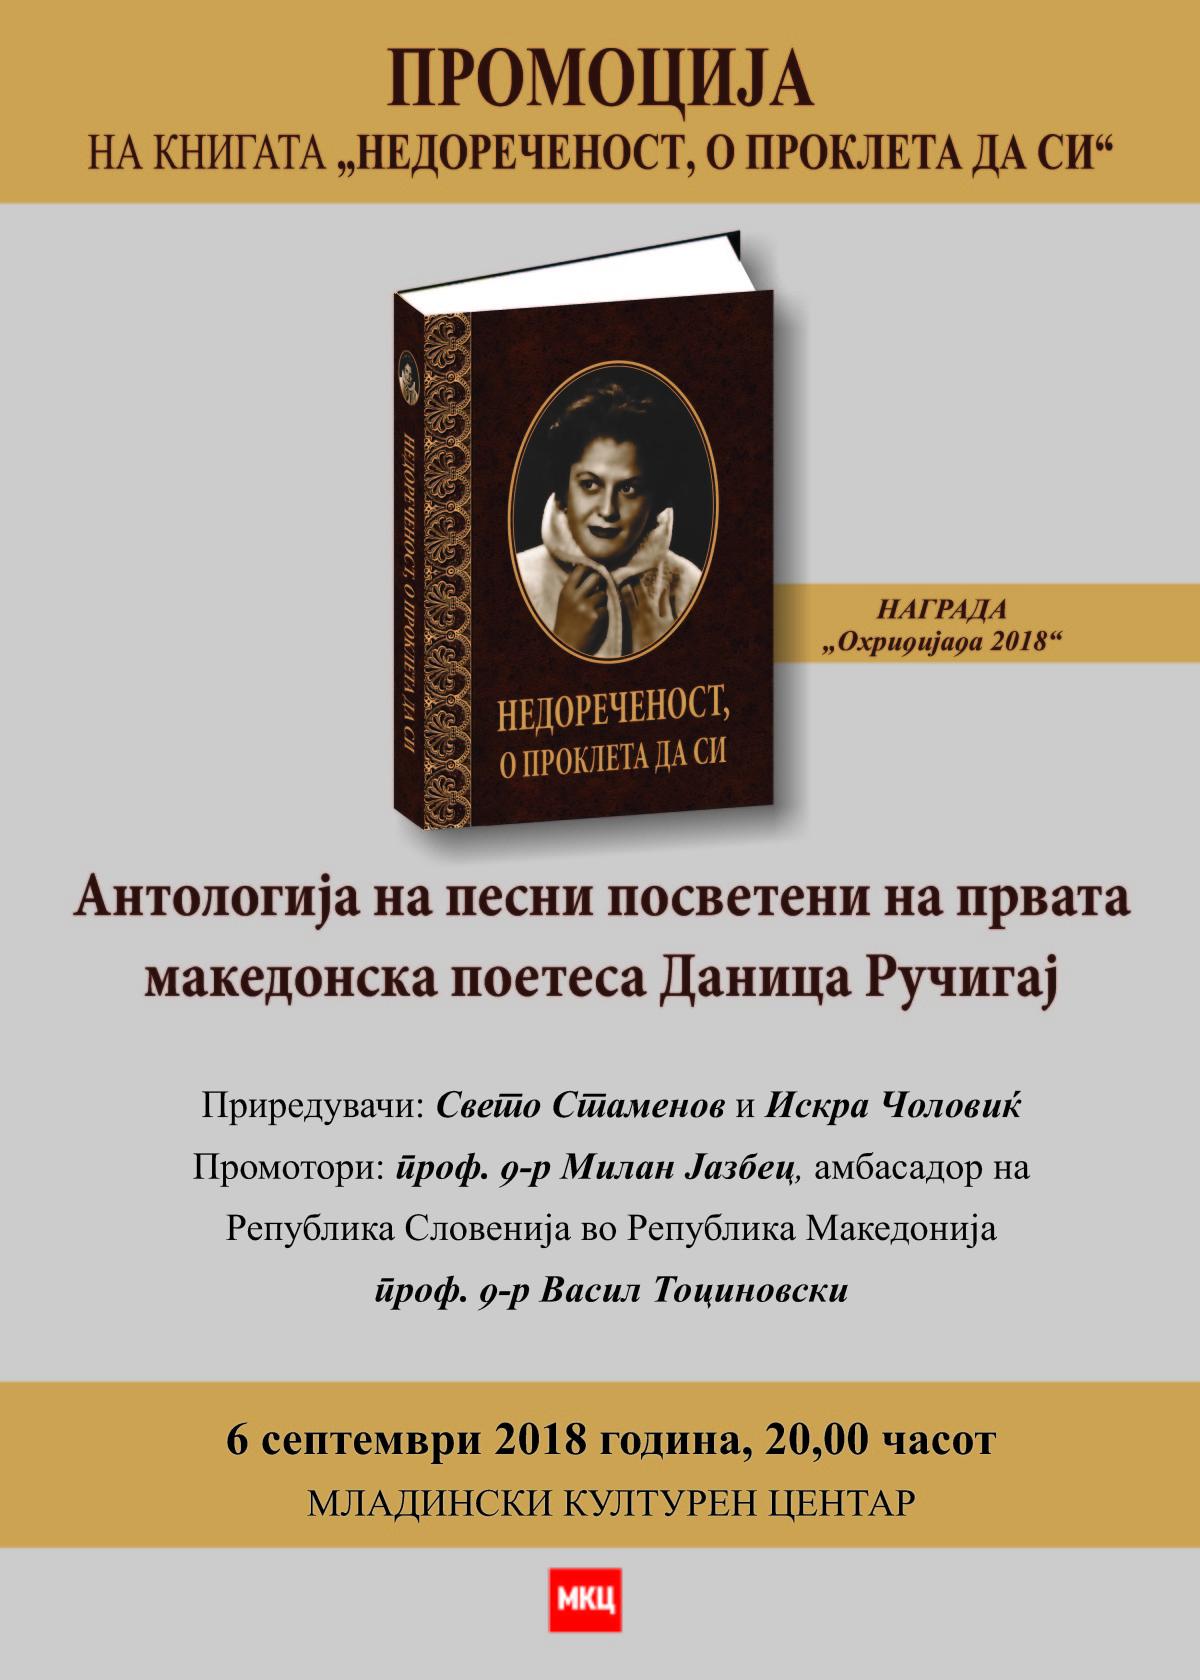 Poster Kniga